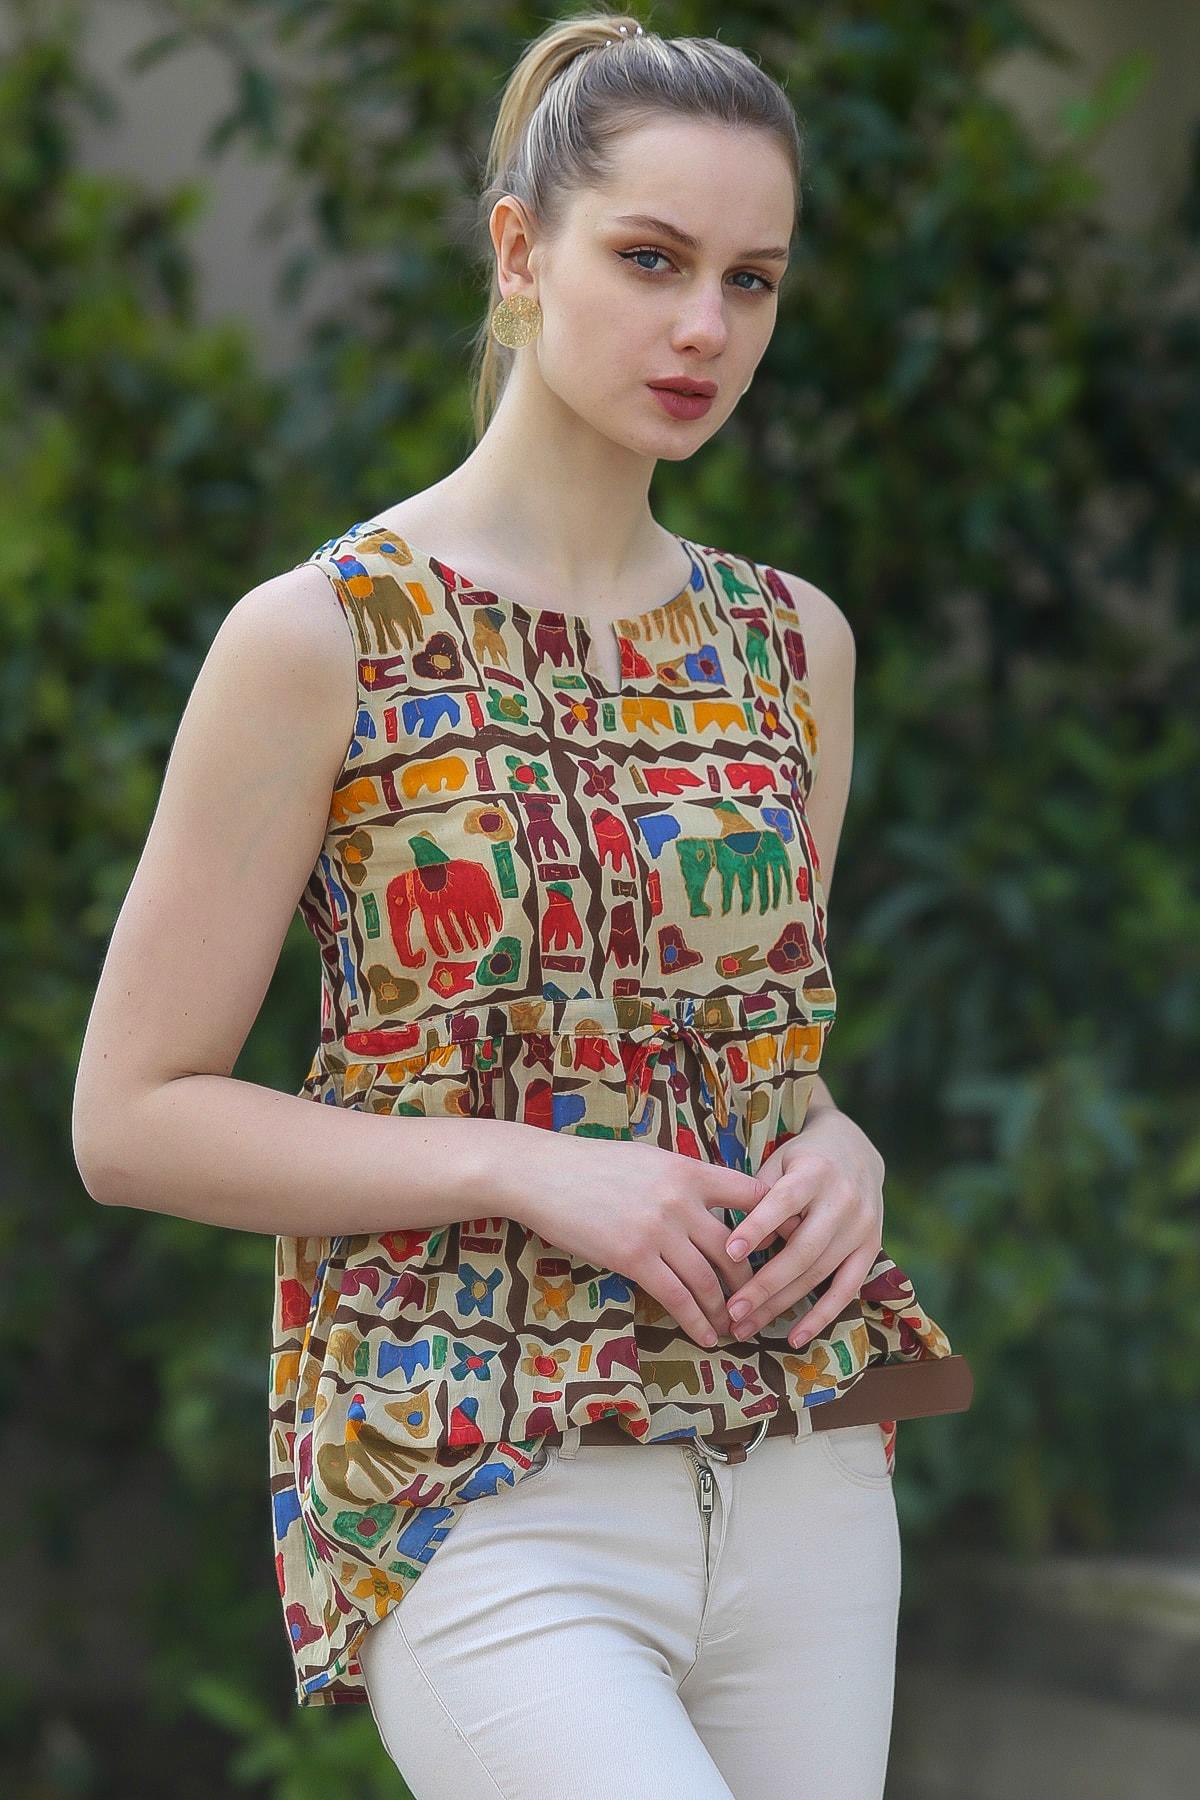 Chiccy Kadın Bej Sıfır Yaka Kolsuz Robası Büzgülü Fil Desenli Dokuma Bluz M10010200BL95381 3